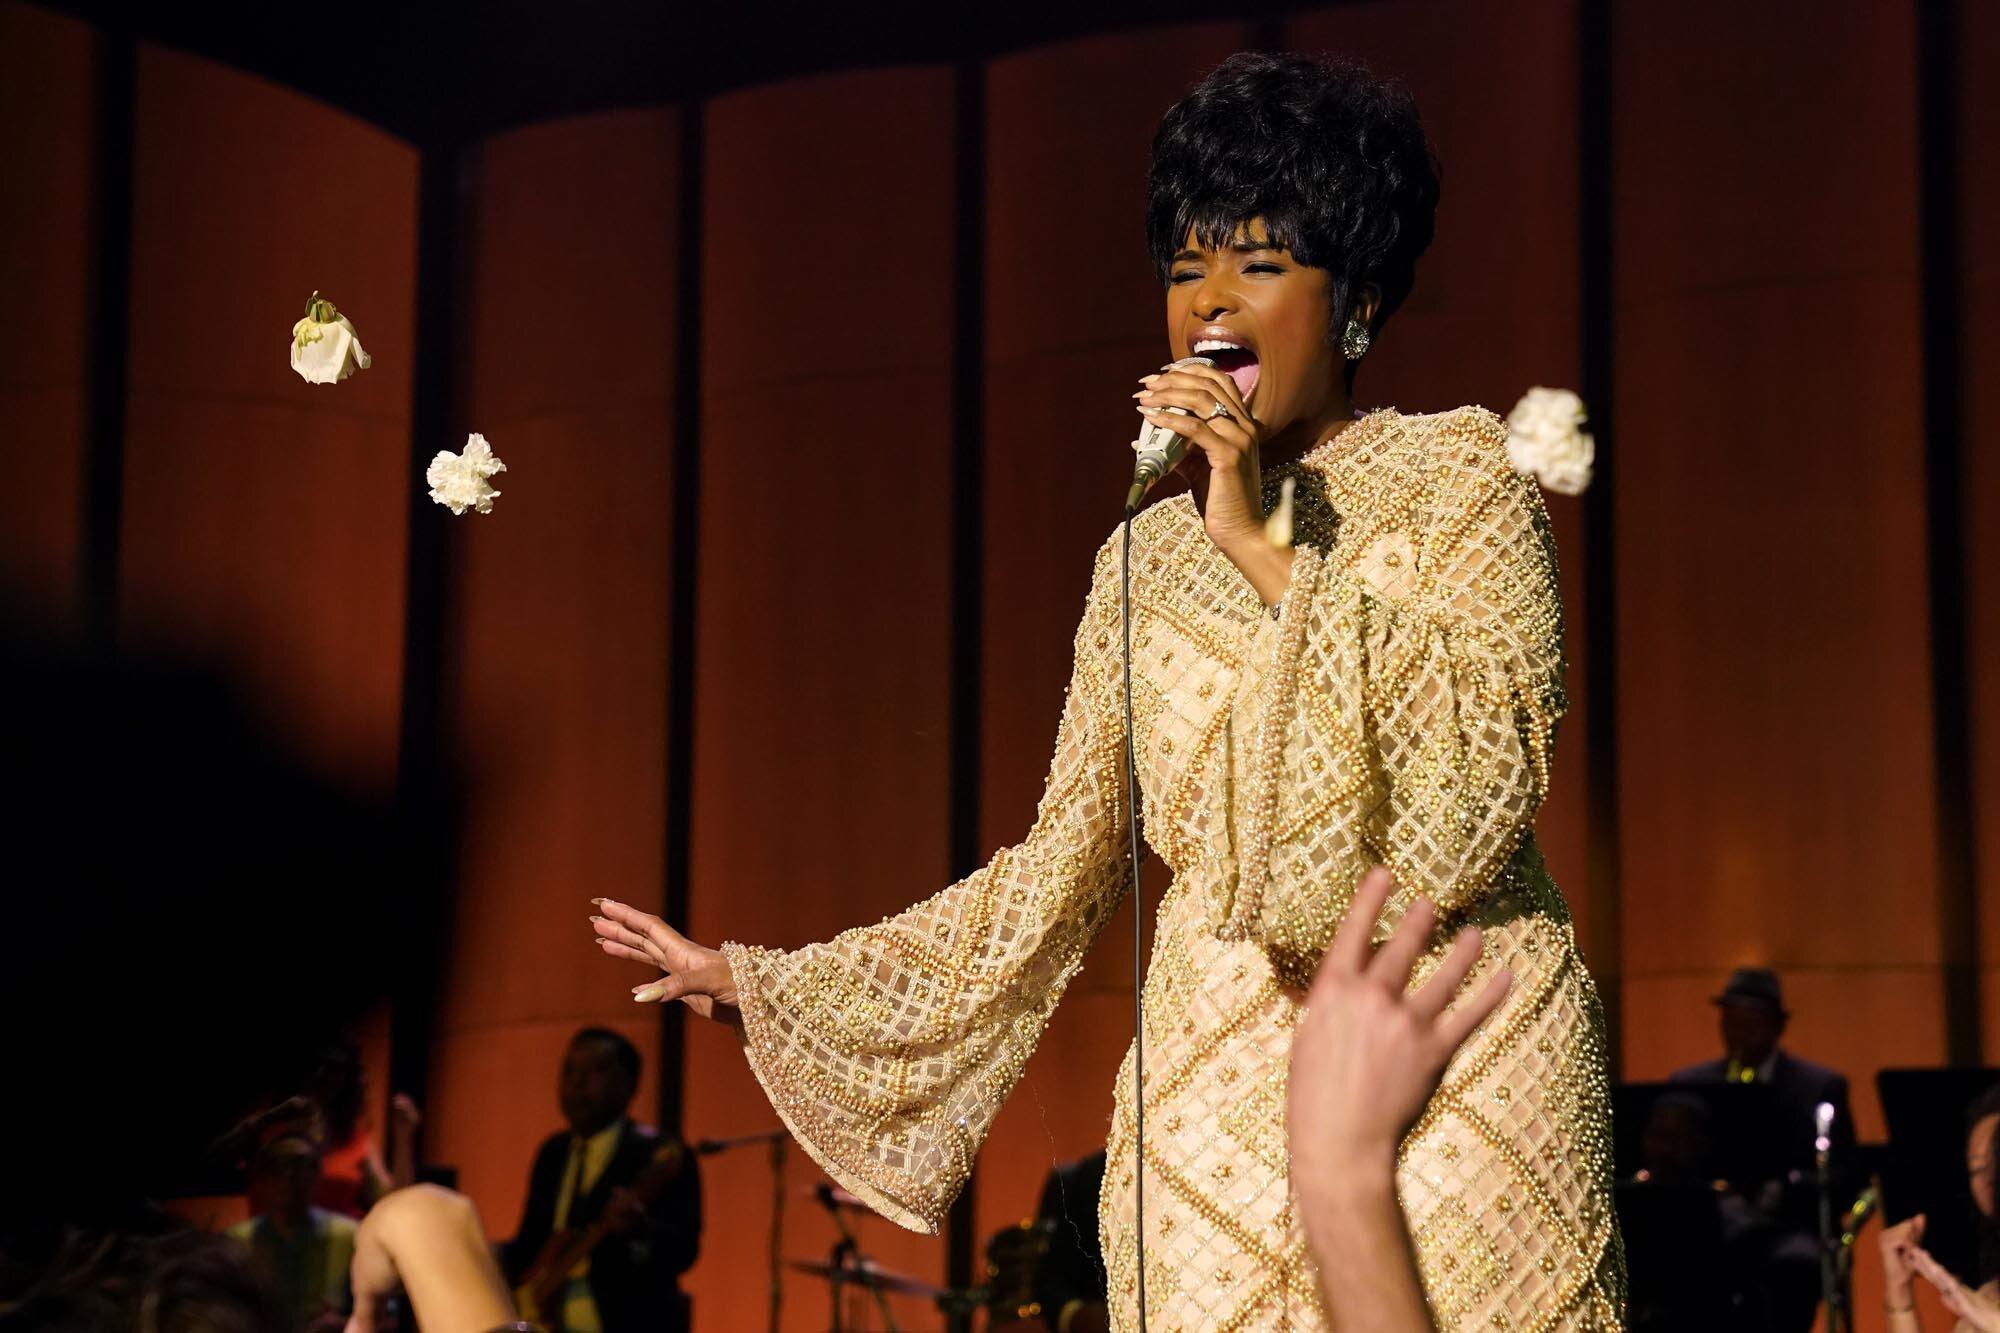 Jennifer Hudson's Aretha Franklin biopic Respect delayed until August 2021 | EW.com